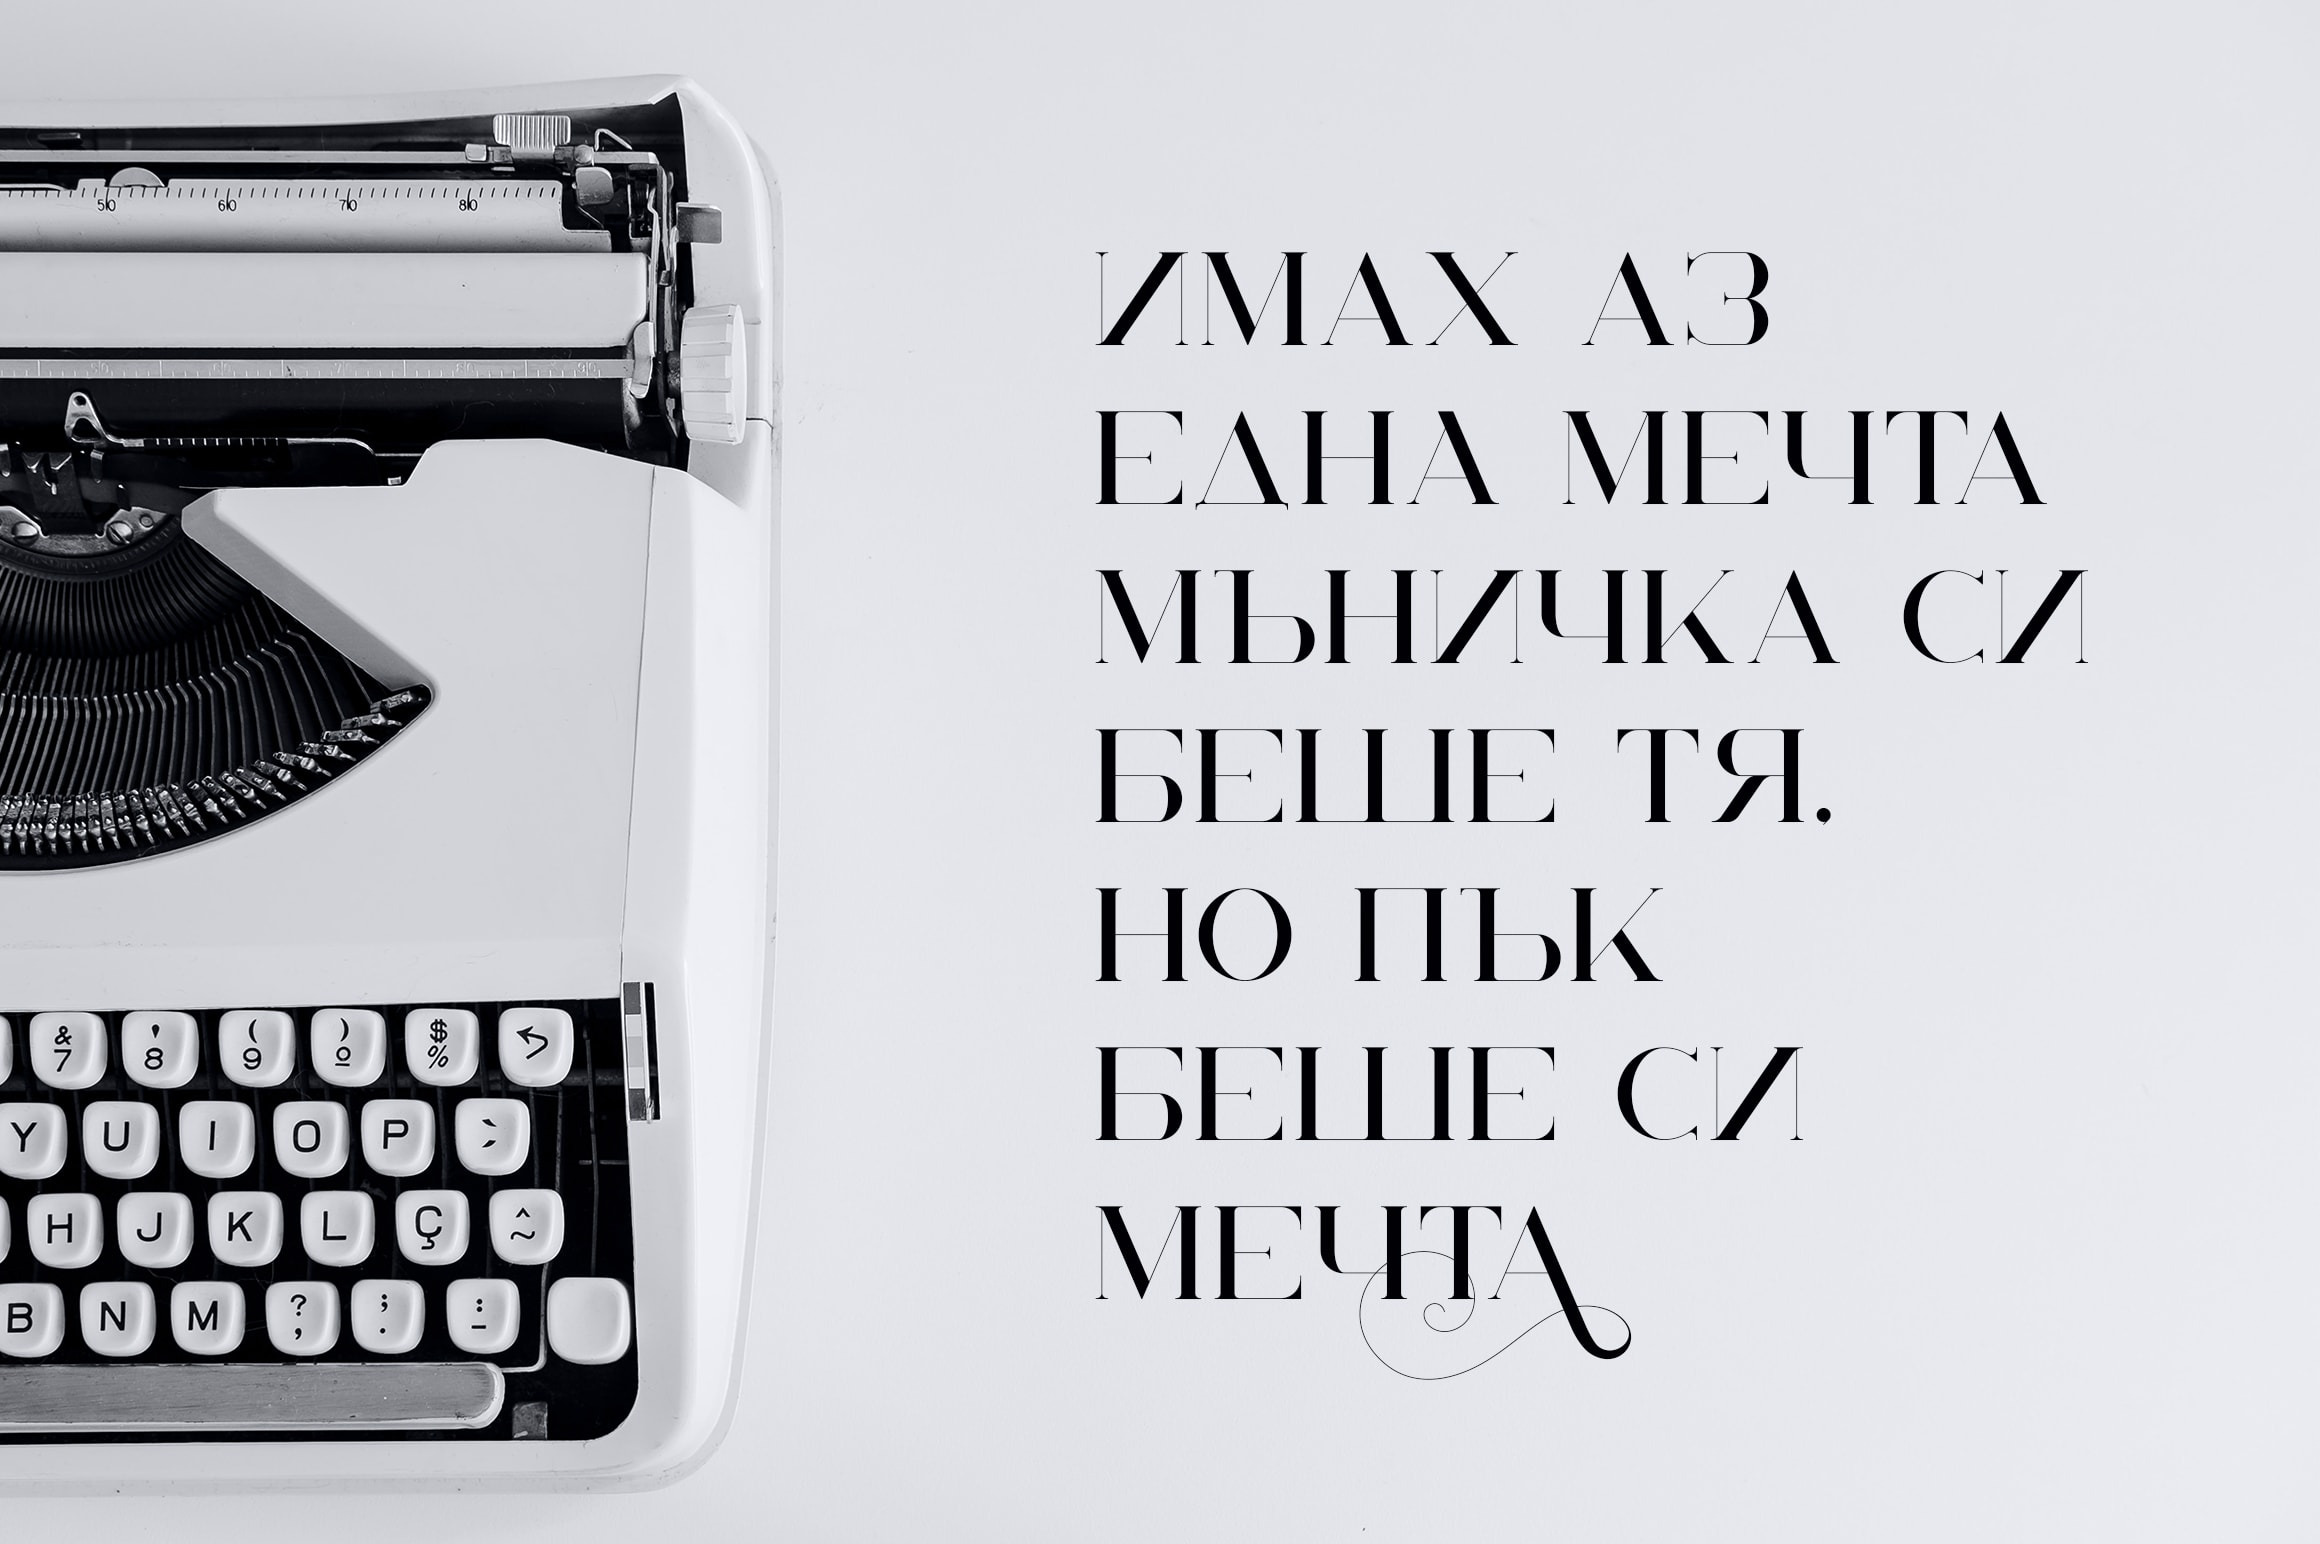 Unreal Serif Font: Latin & Cyrillic - 8 min